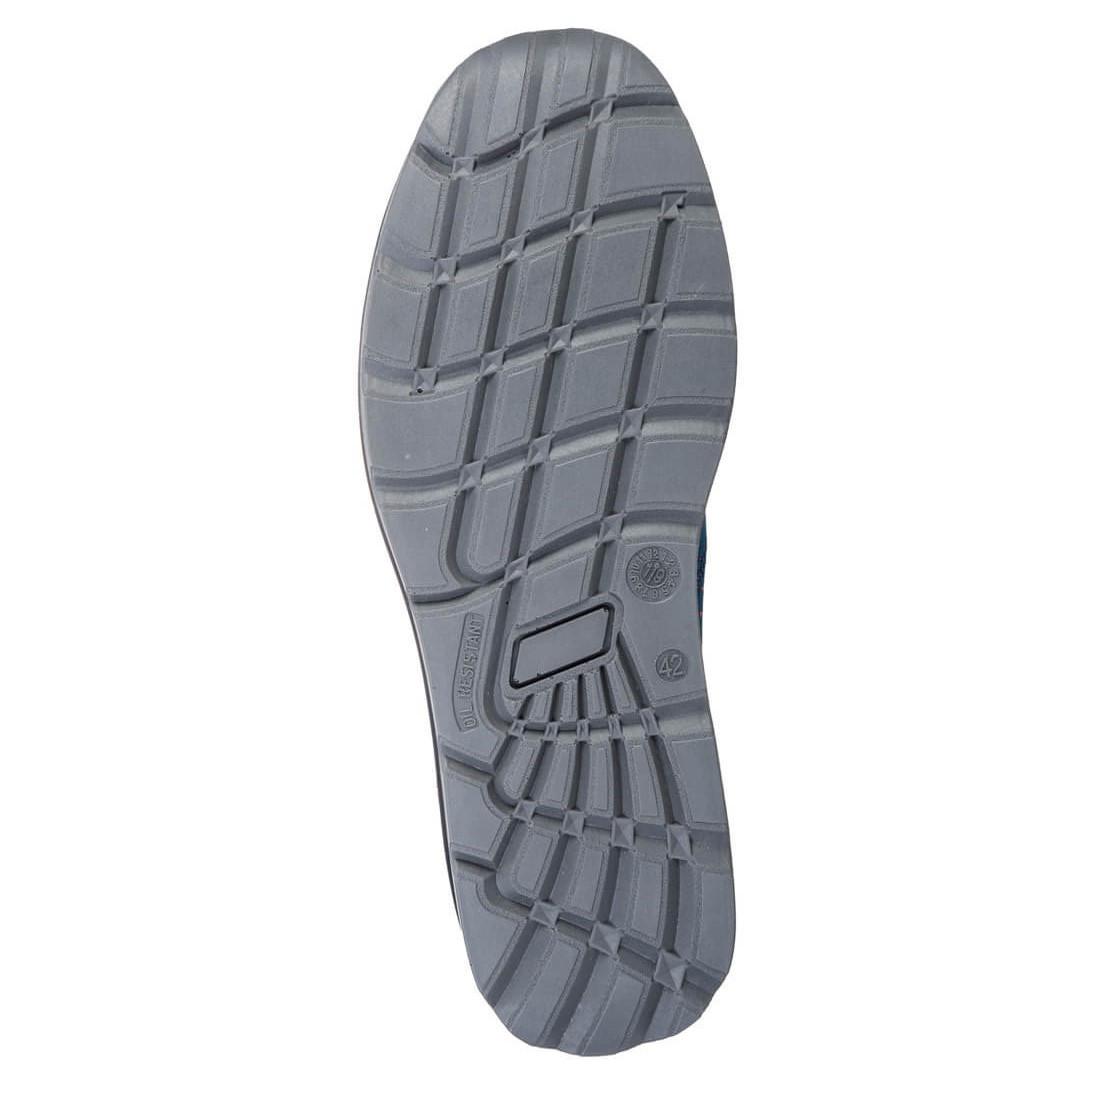 Pantofi Steelite Mersey S1 - Incaltaminte de protectie